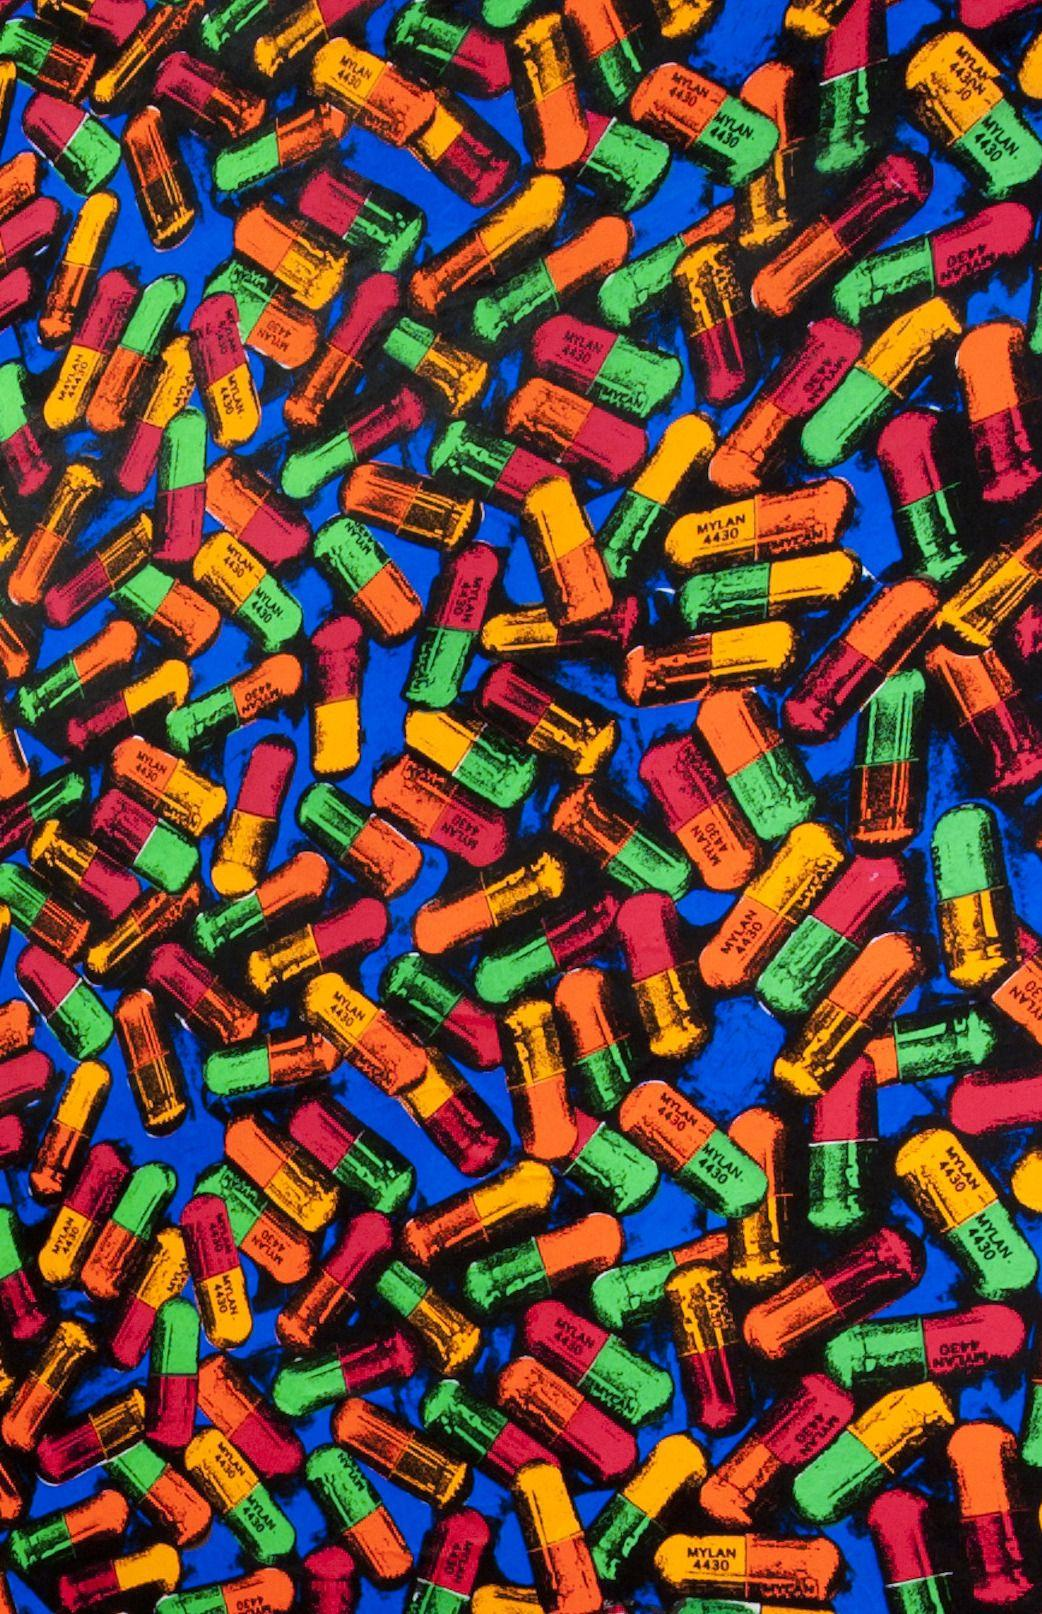 Drugs Wallpapers Tumblr Wallpaper Cave